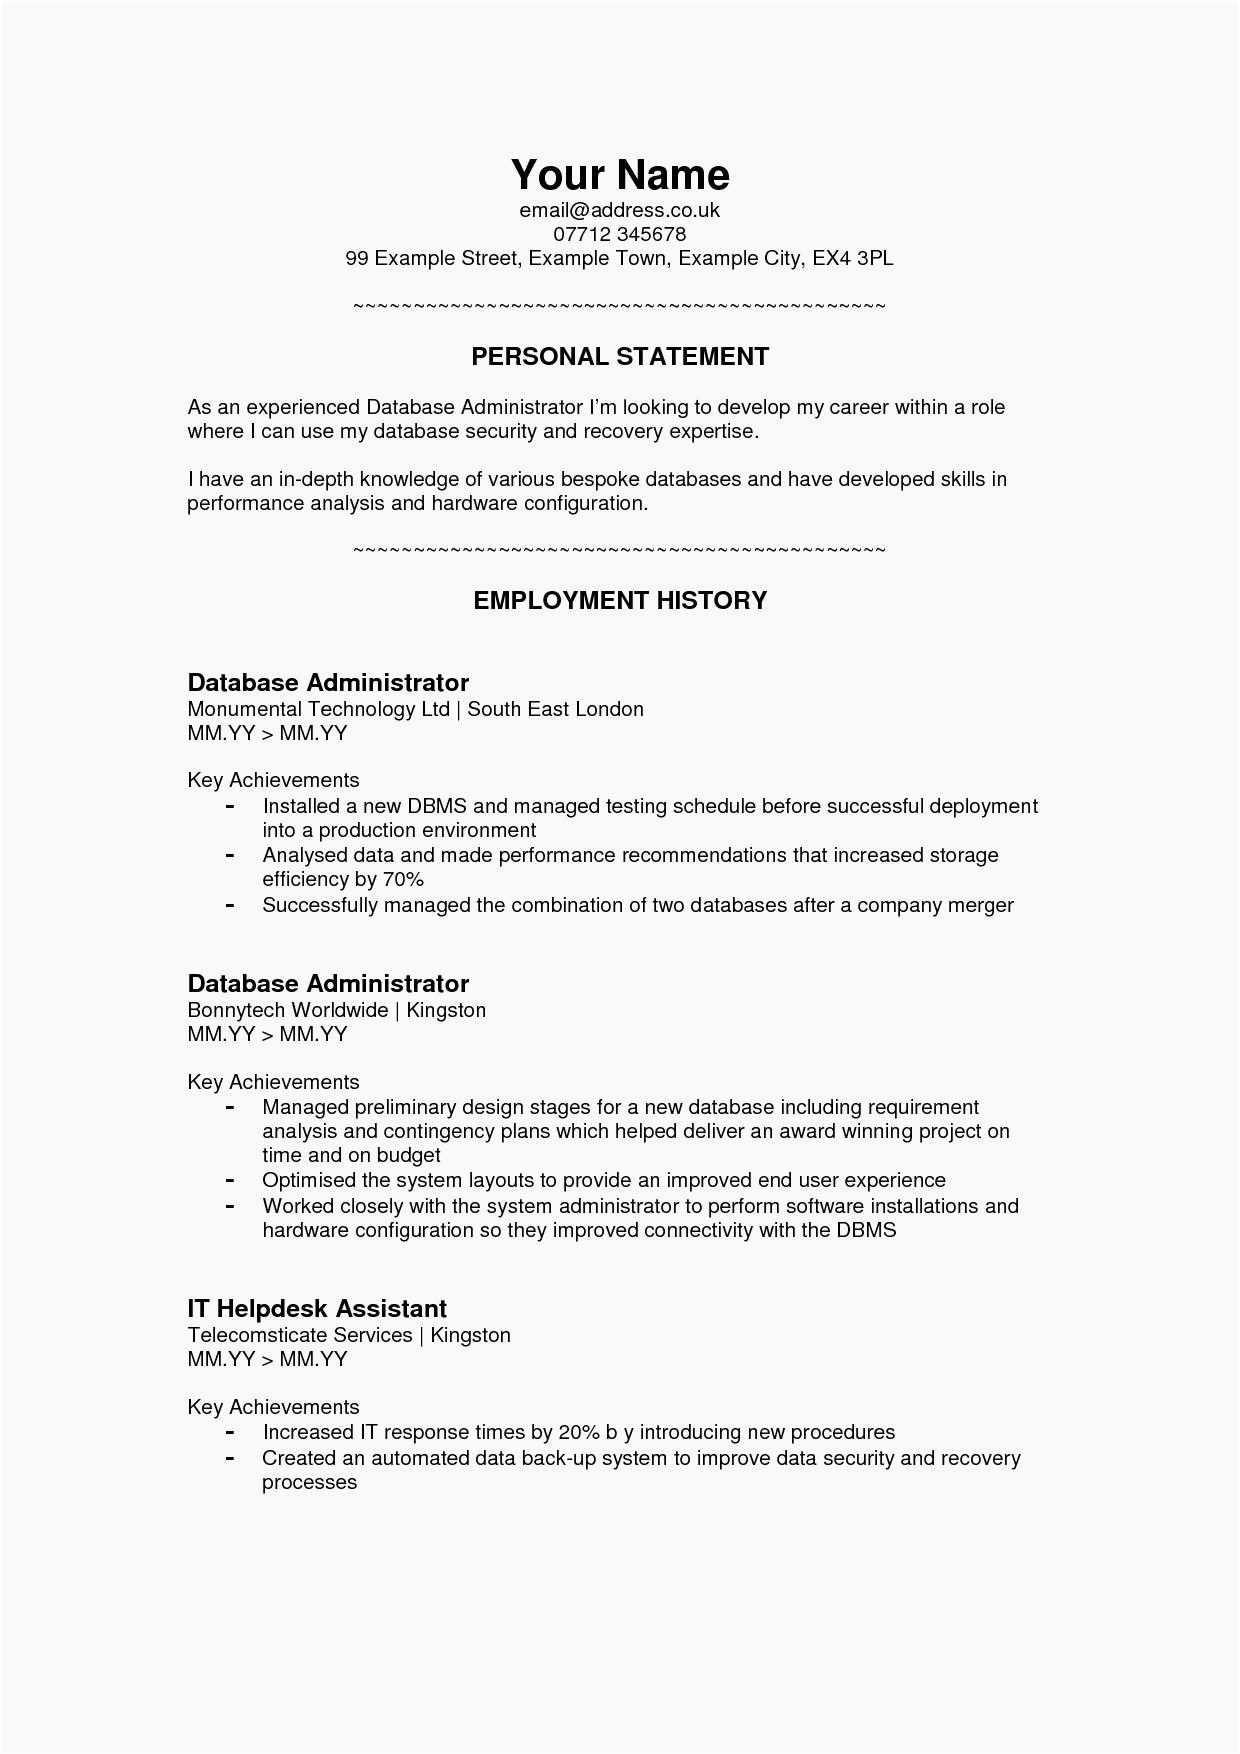 Resume Summary Statement Sample Resume Declaration Format New 22 Resume Summary Statement